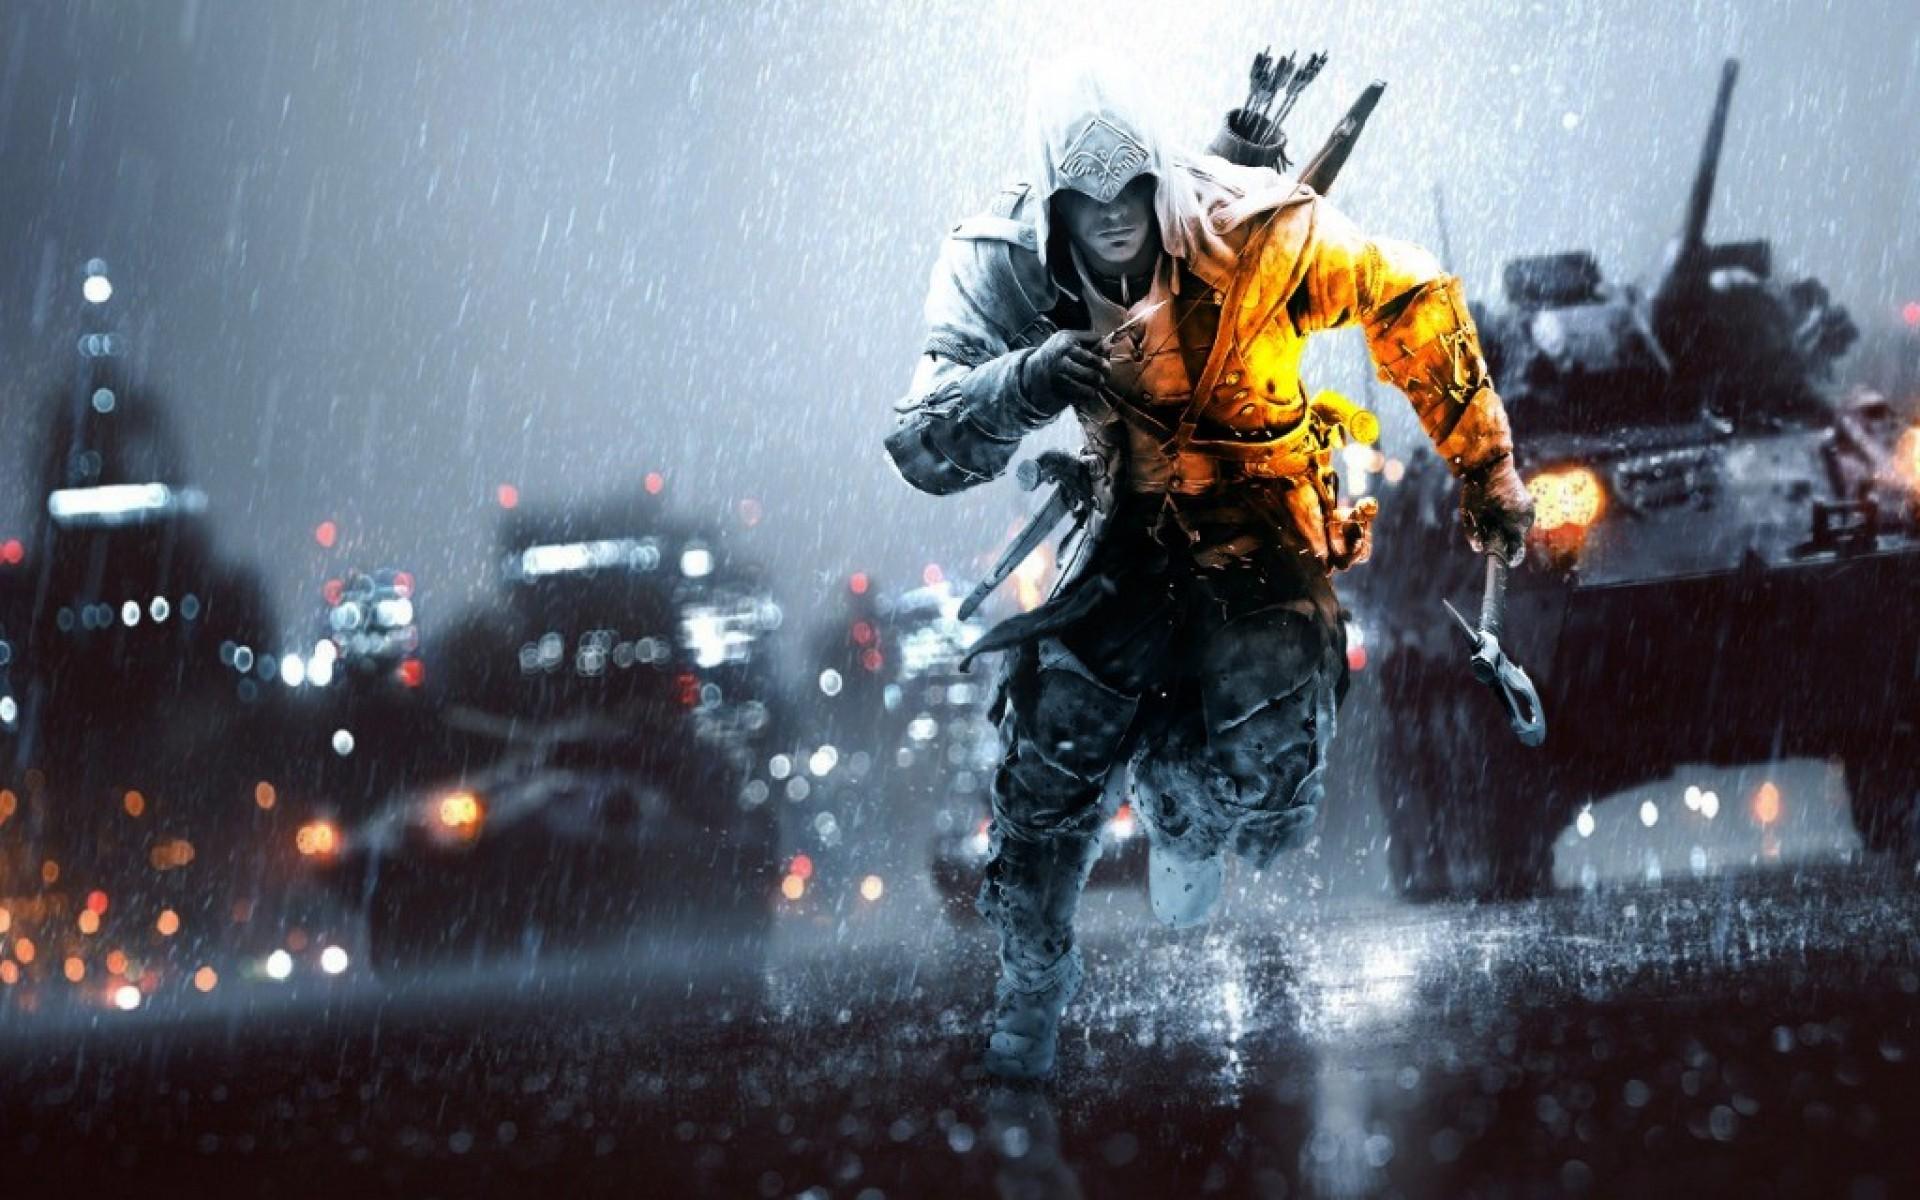 Battlefield 4 Wallpaper - WallpaperSafari